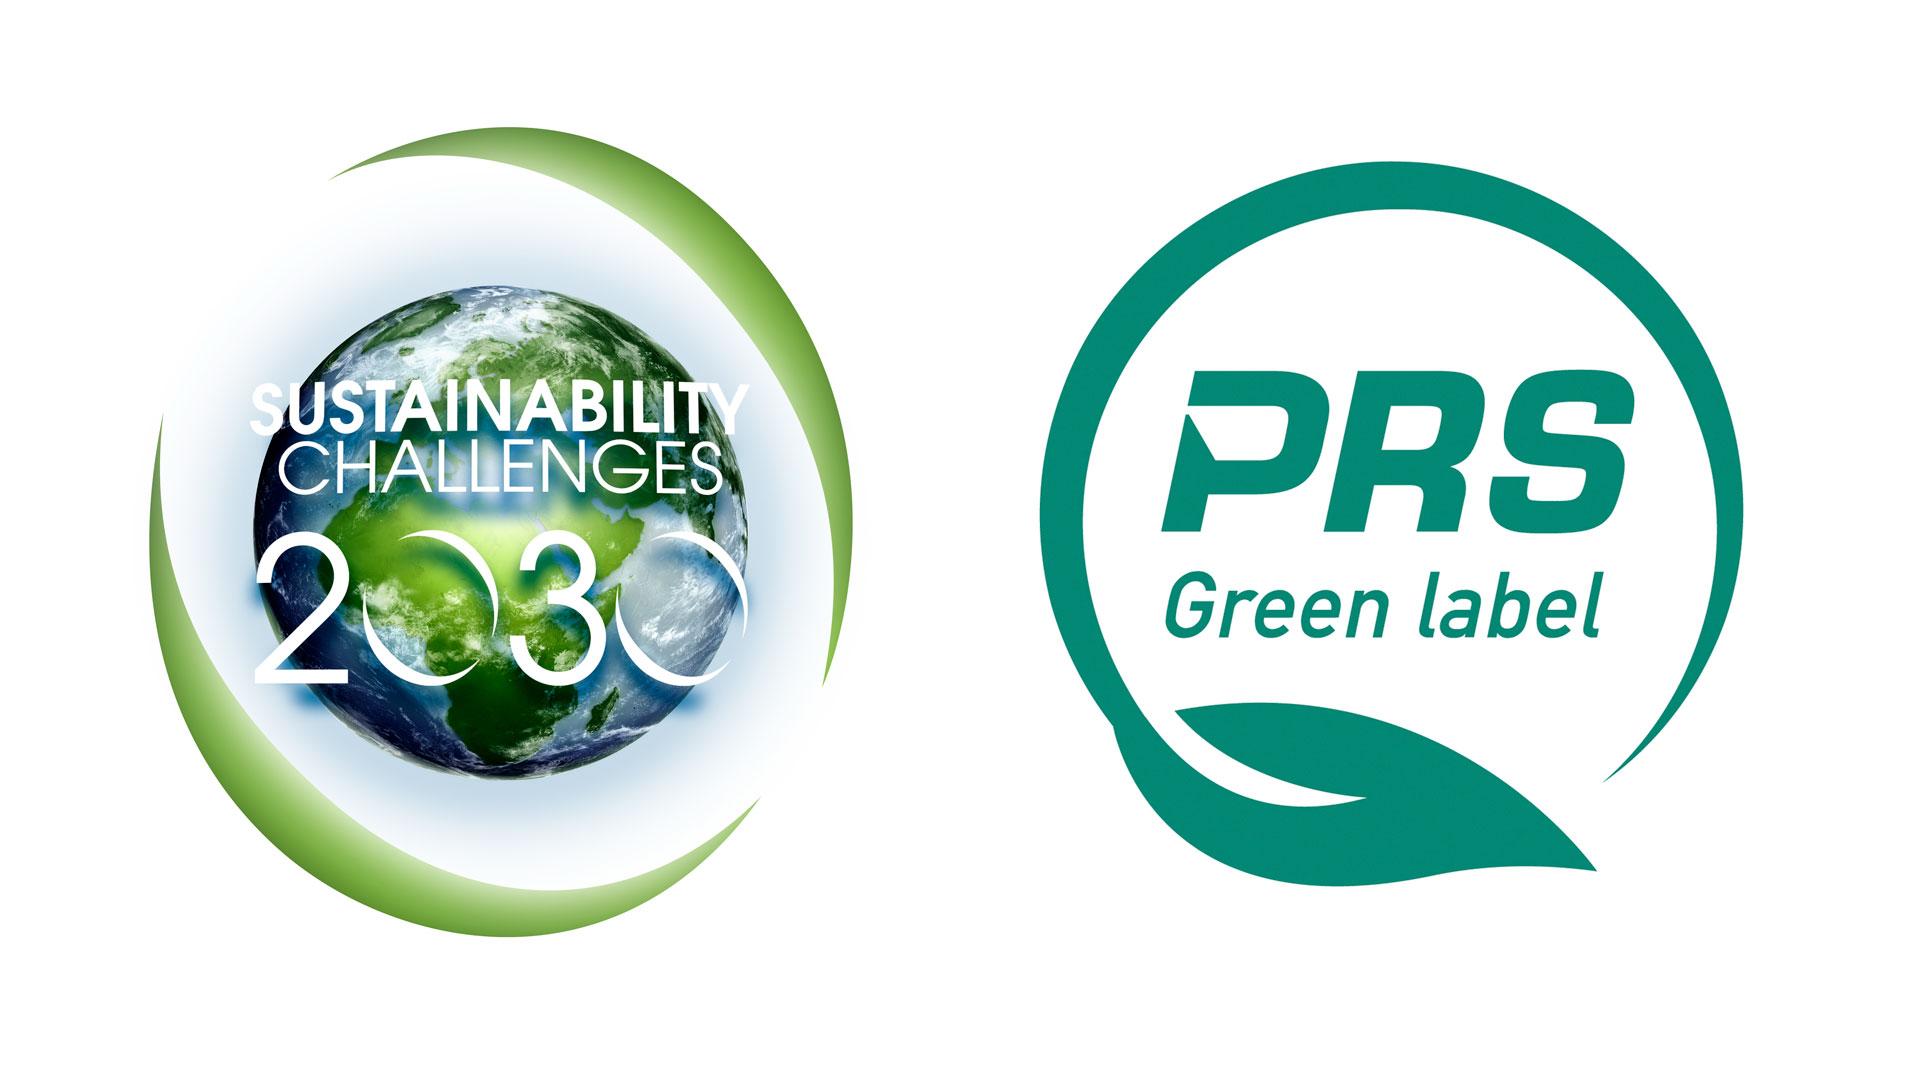 ducor-logo-sustainabilitychallenge-prs